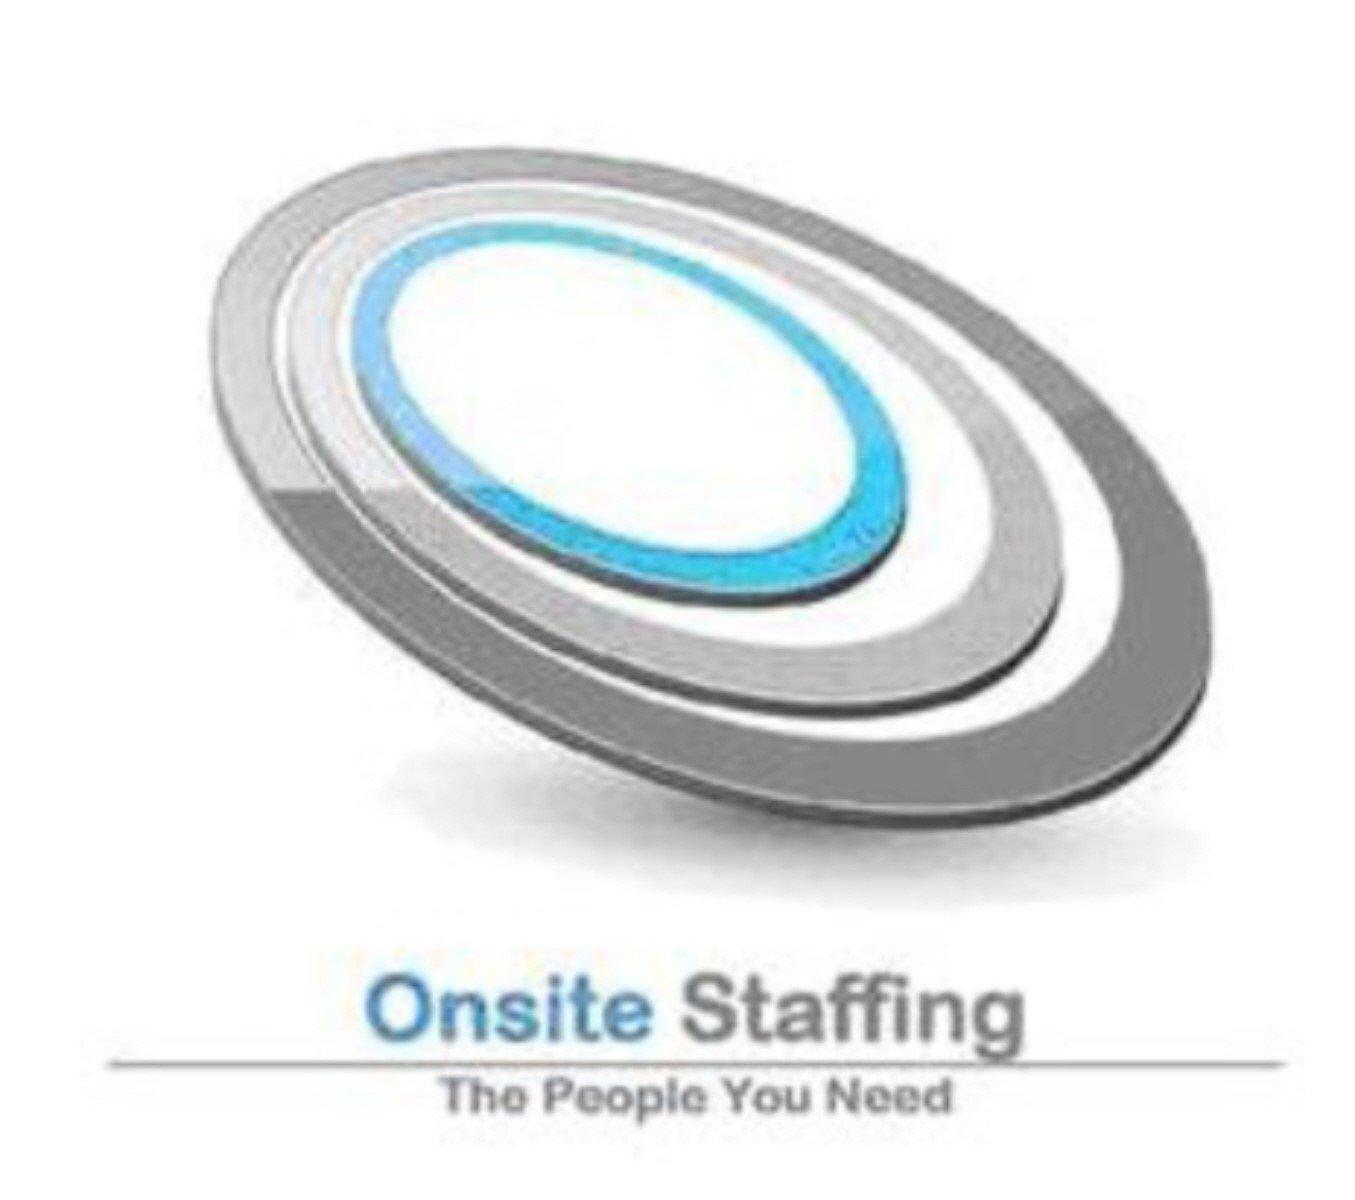 Onsite Staffing